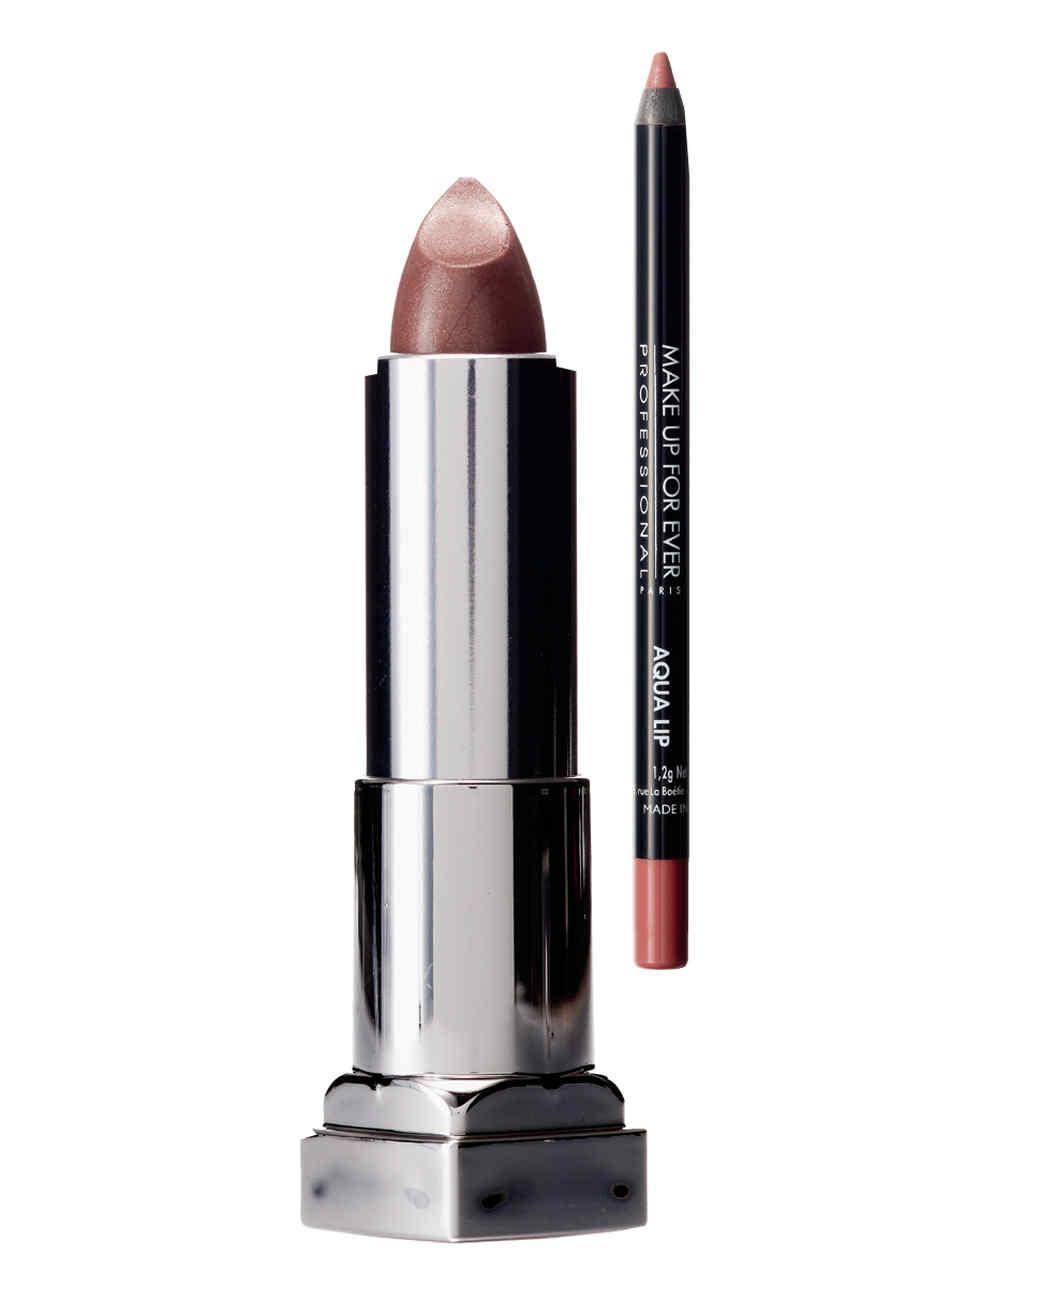 everyday-lipstick-mld109568.jpg